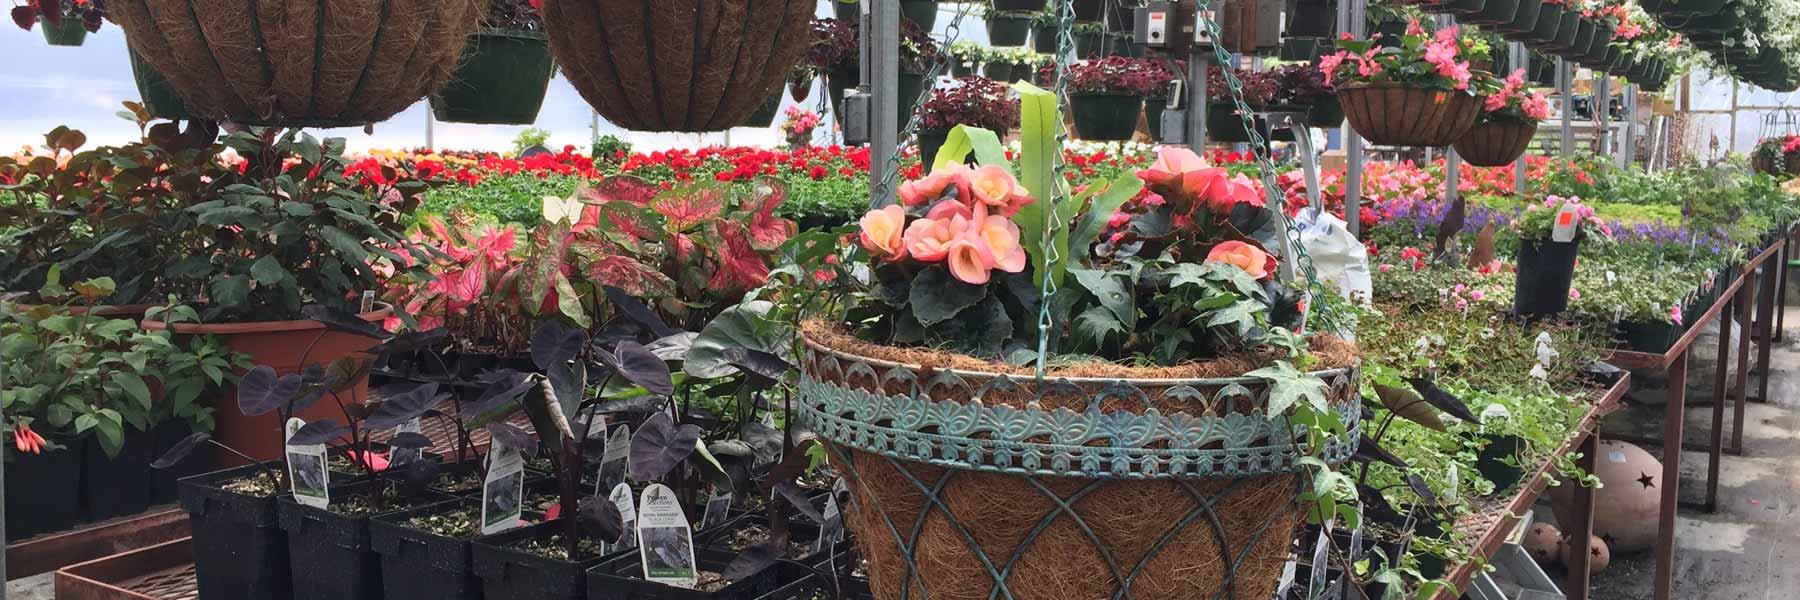 basket greenhouse